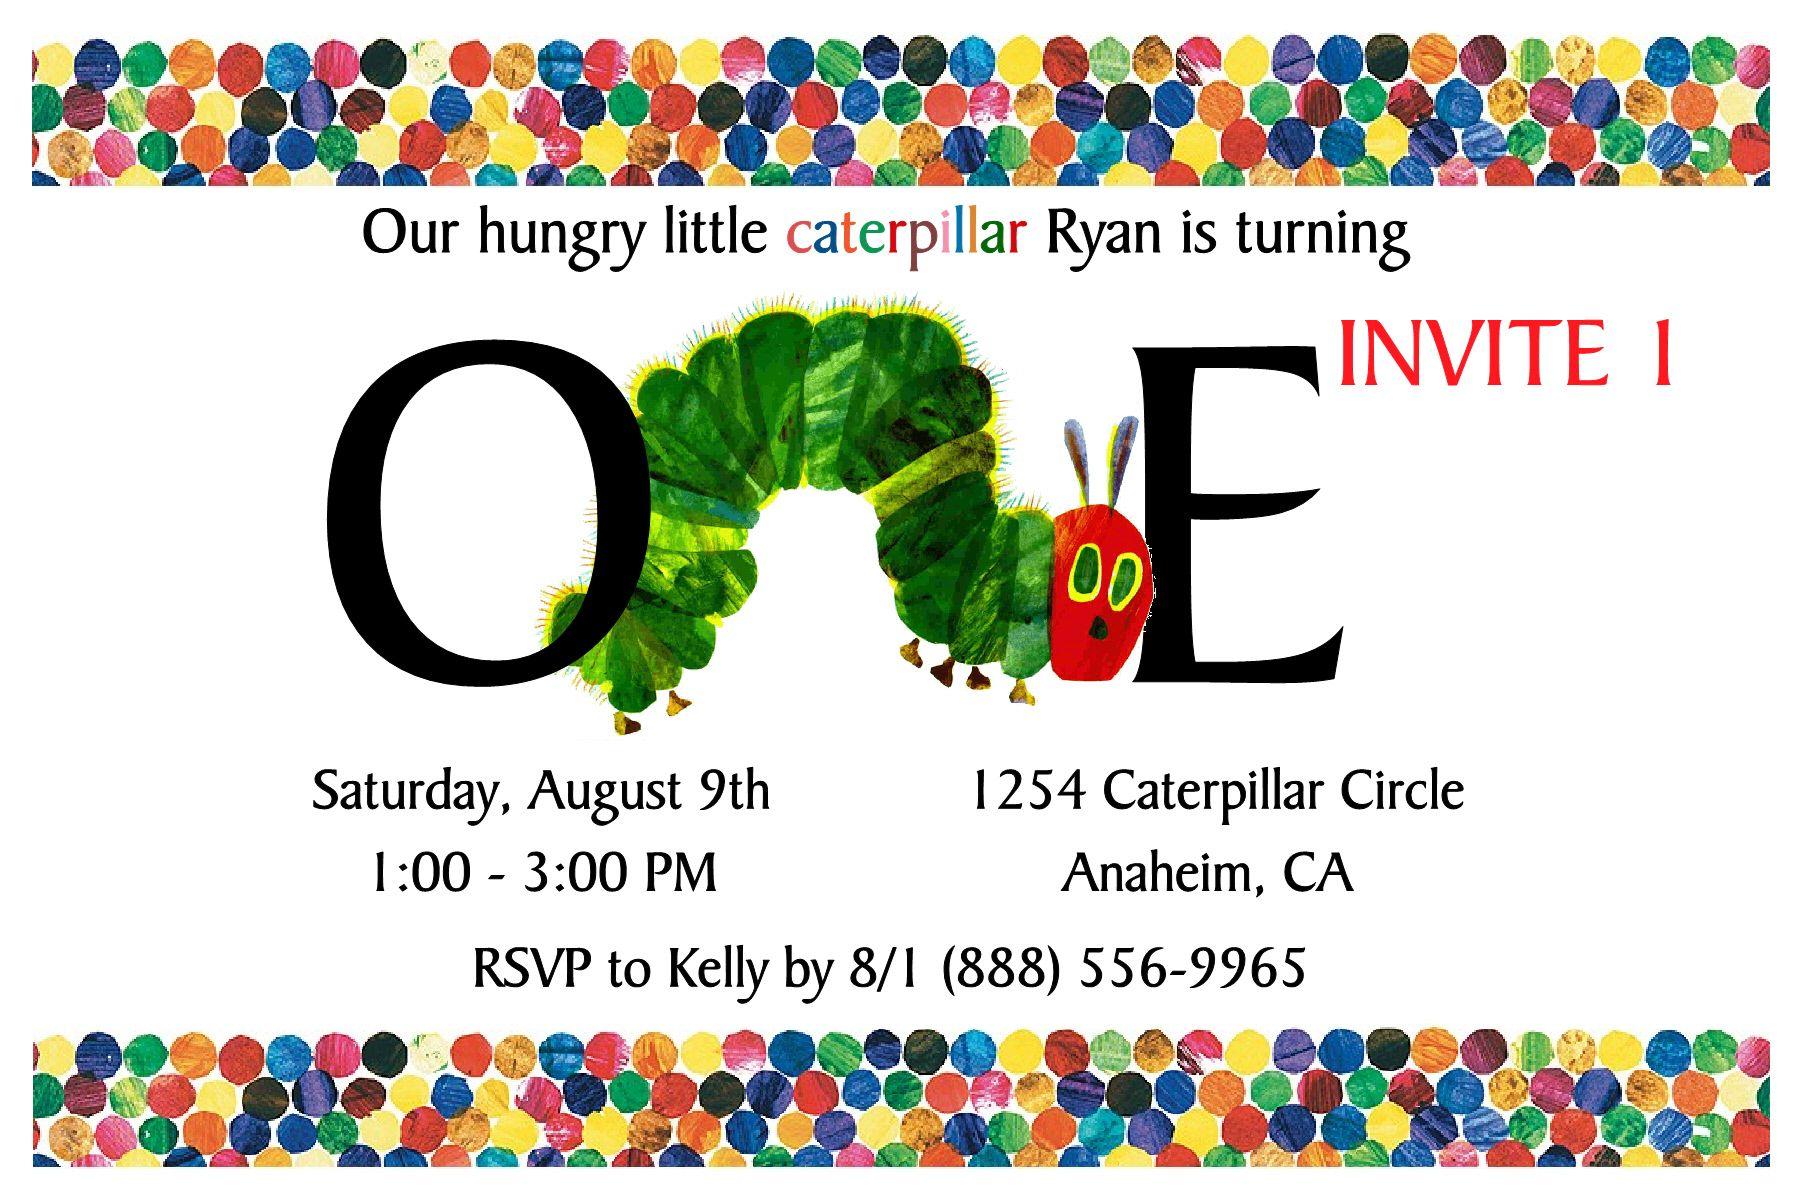 Very Hungry Caterpillar Birthday Invitation on the image